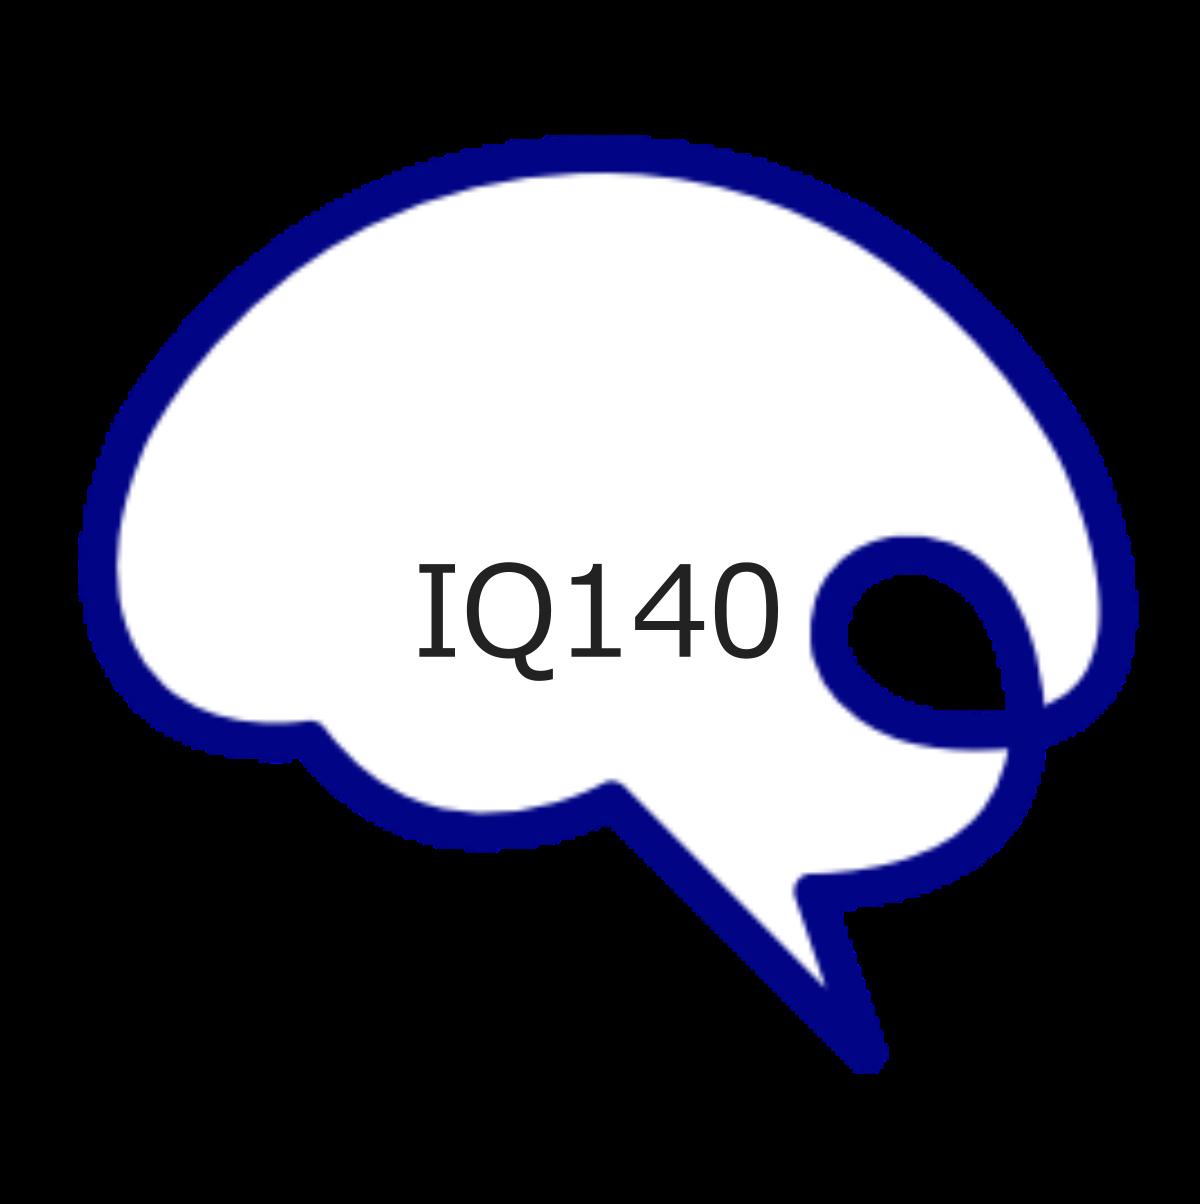 IQ140